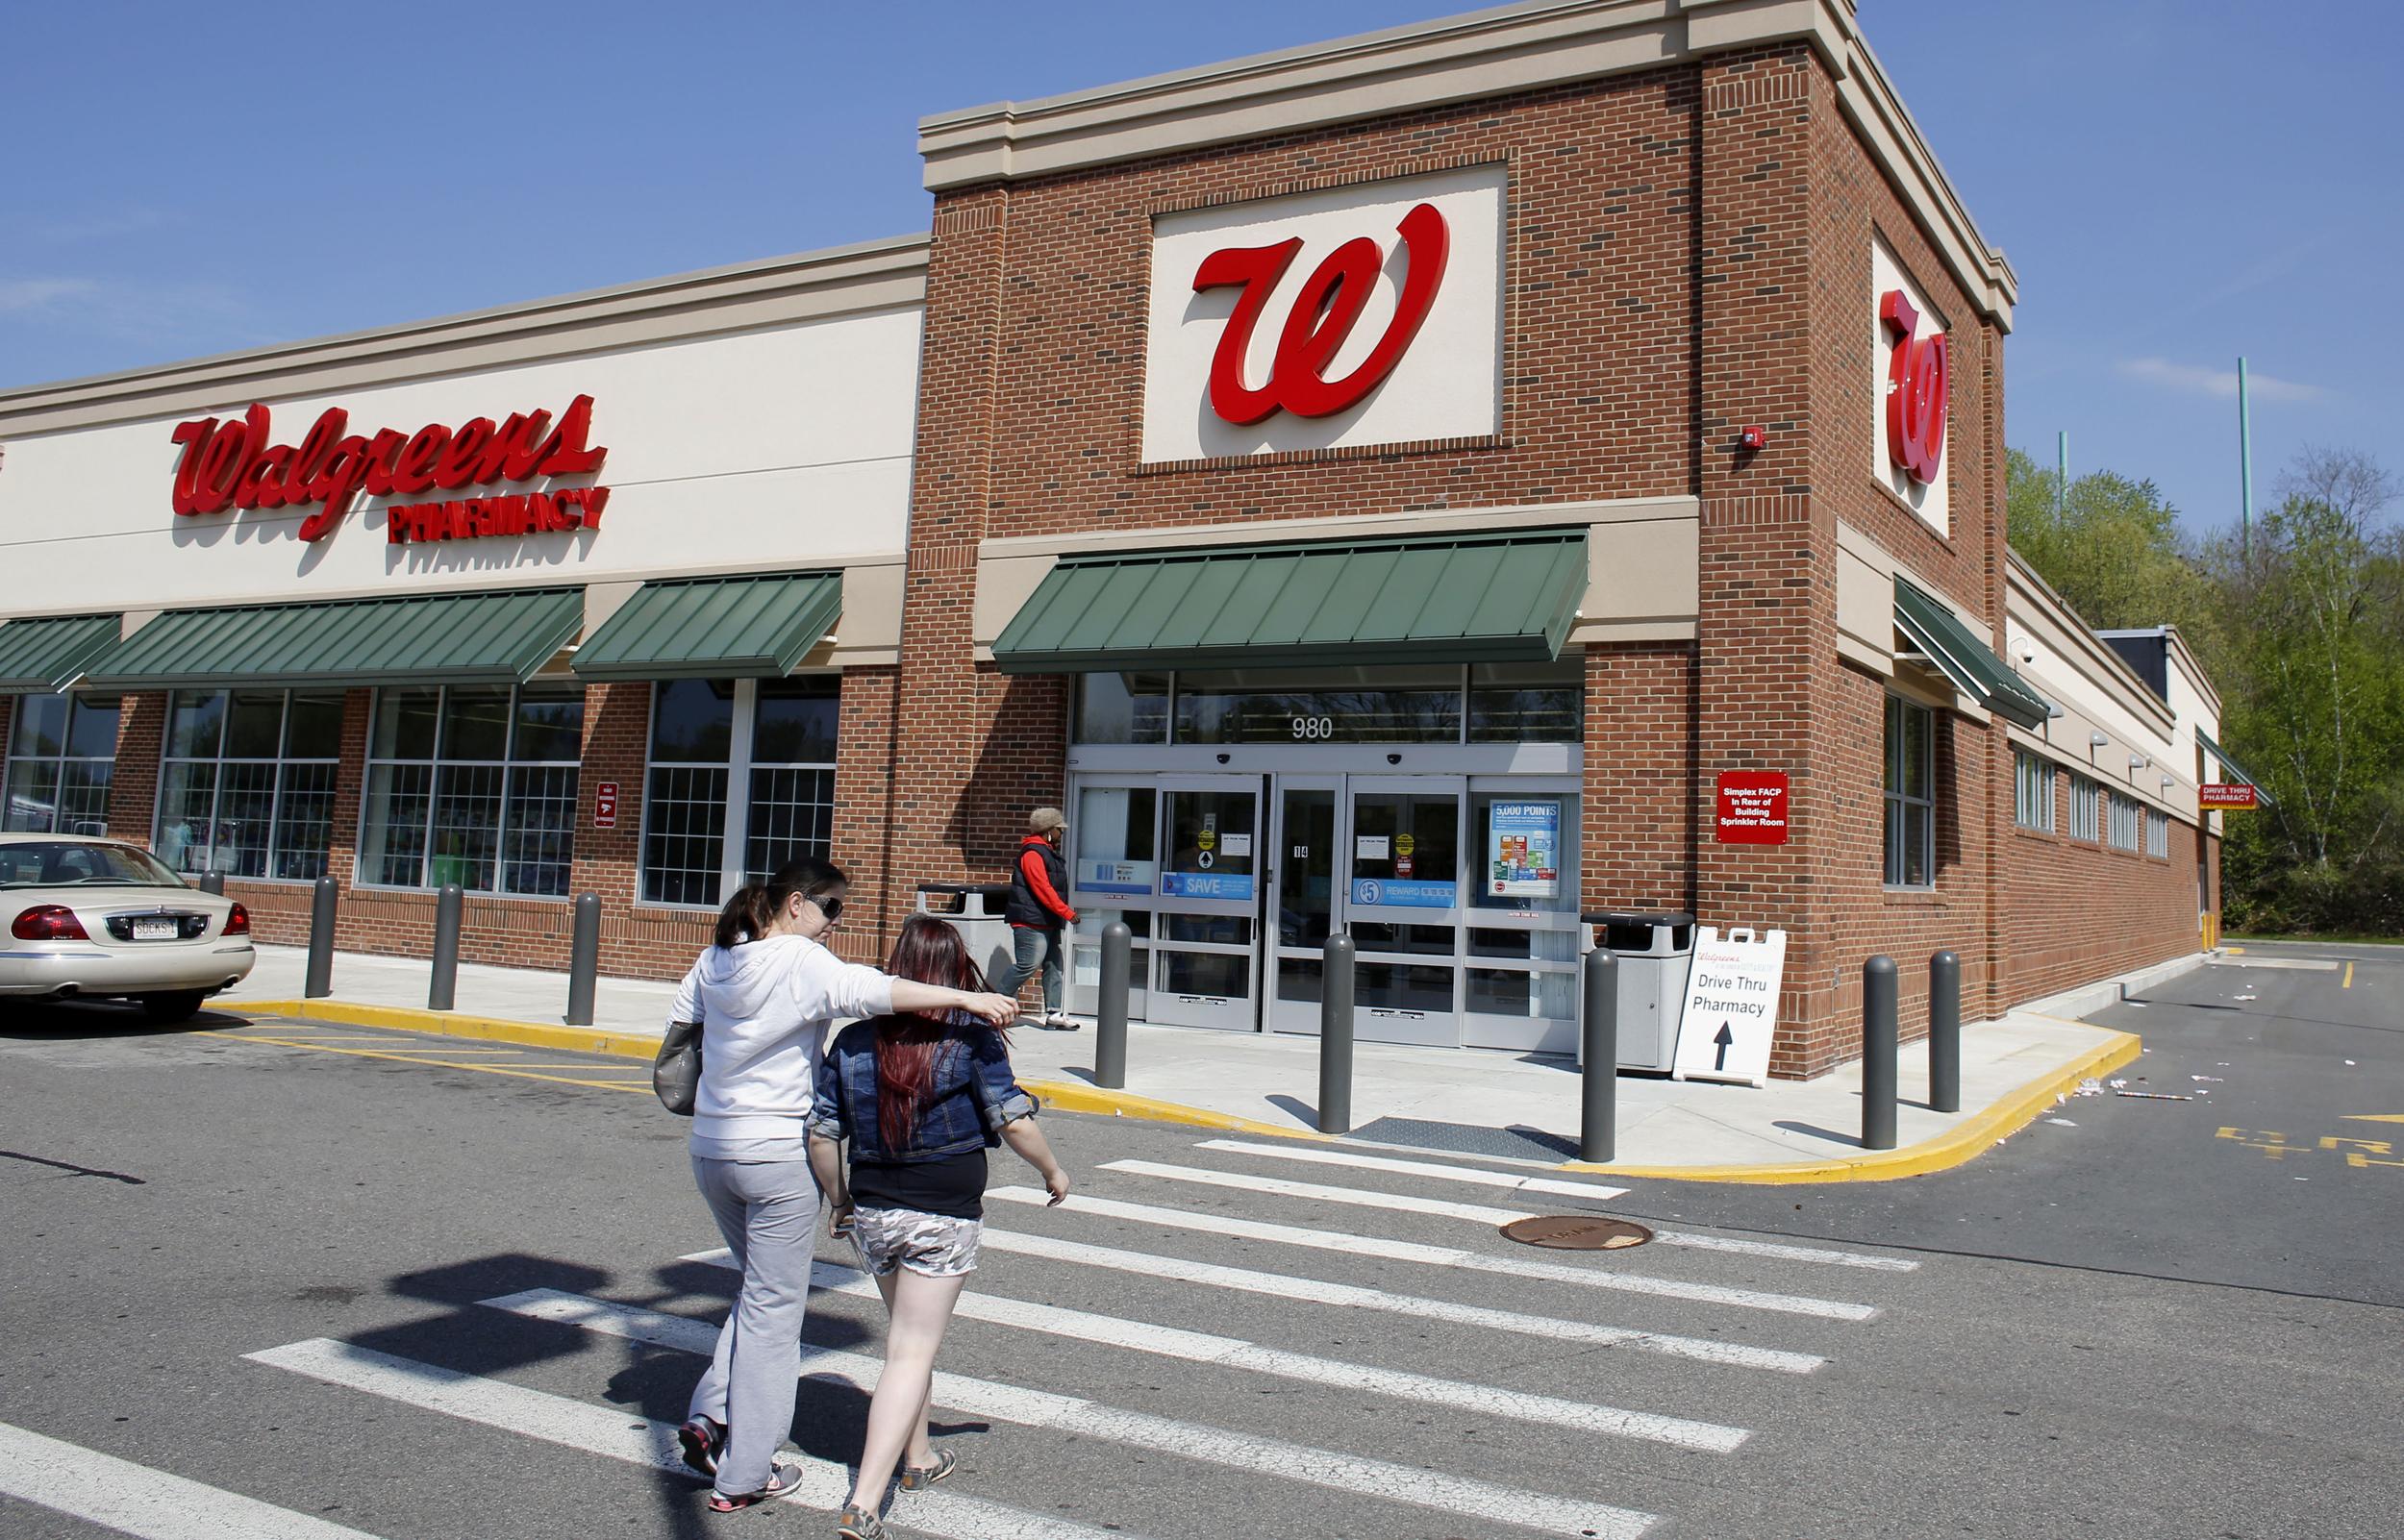 Walgreens Adopts Transgender Inclusive Bathroom Policy